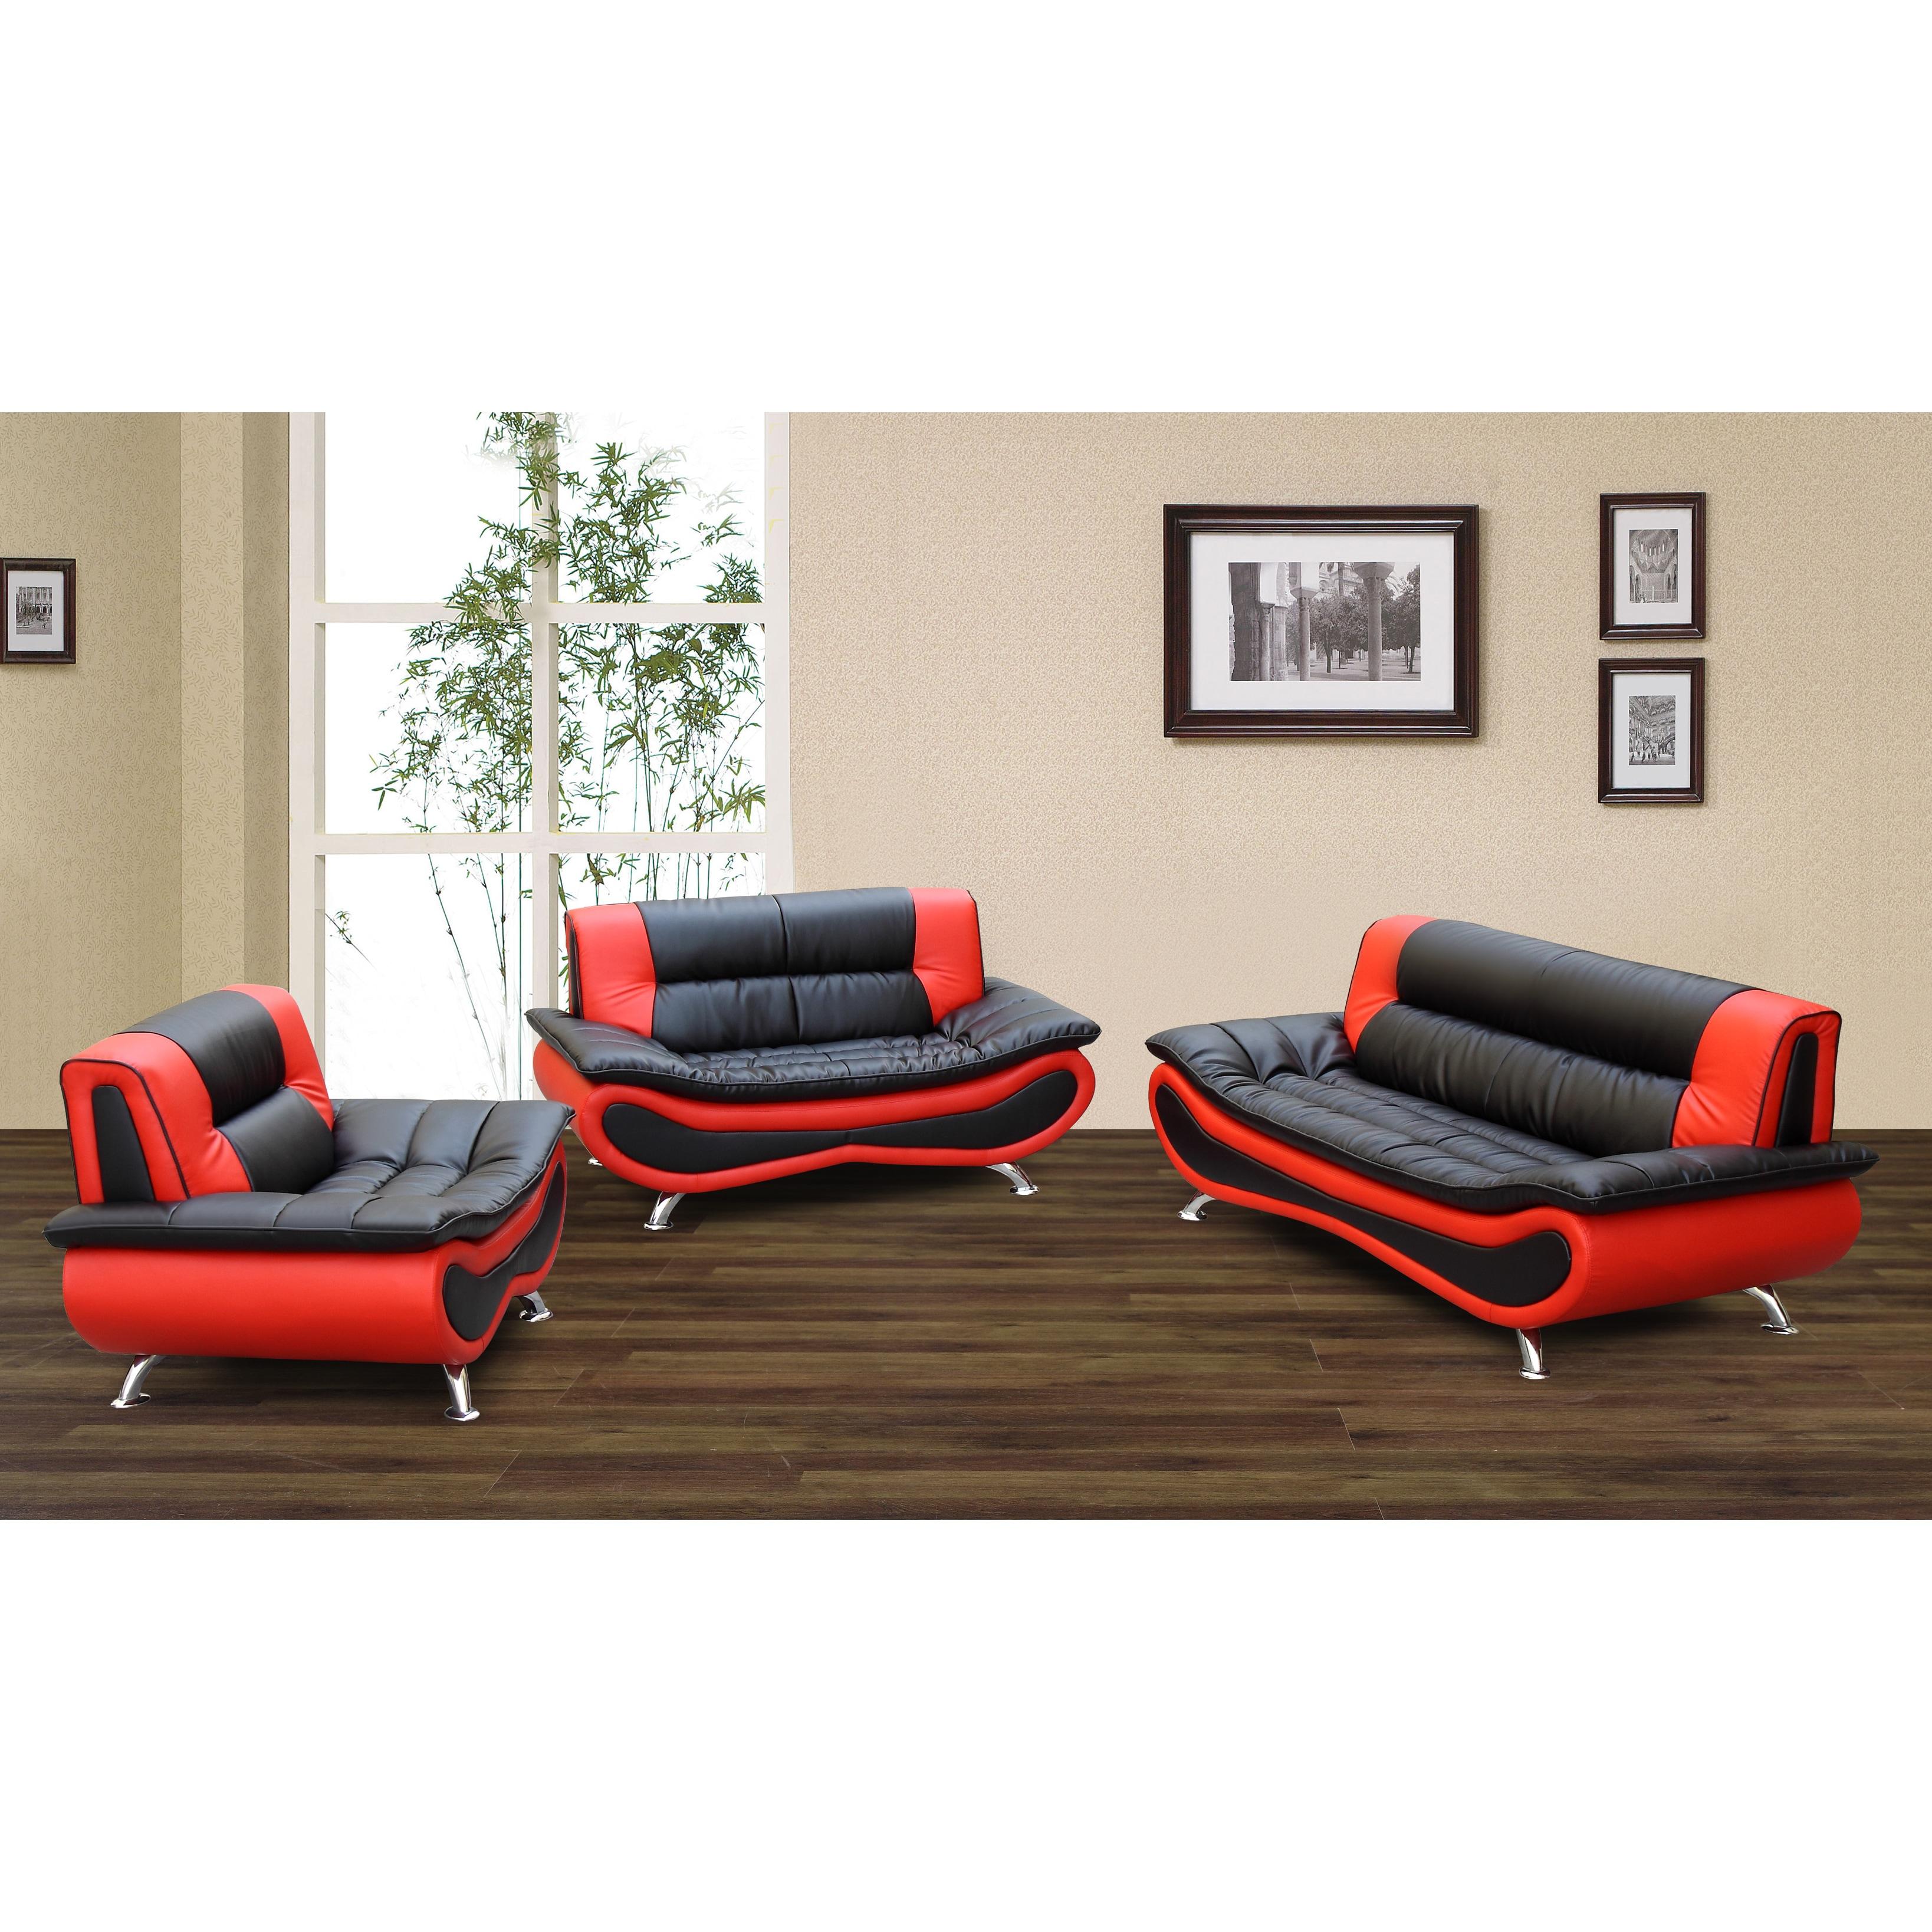 Shop Christina Red/ Black 2-tone Bonded Leather Modern Sofa Set ...